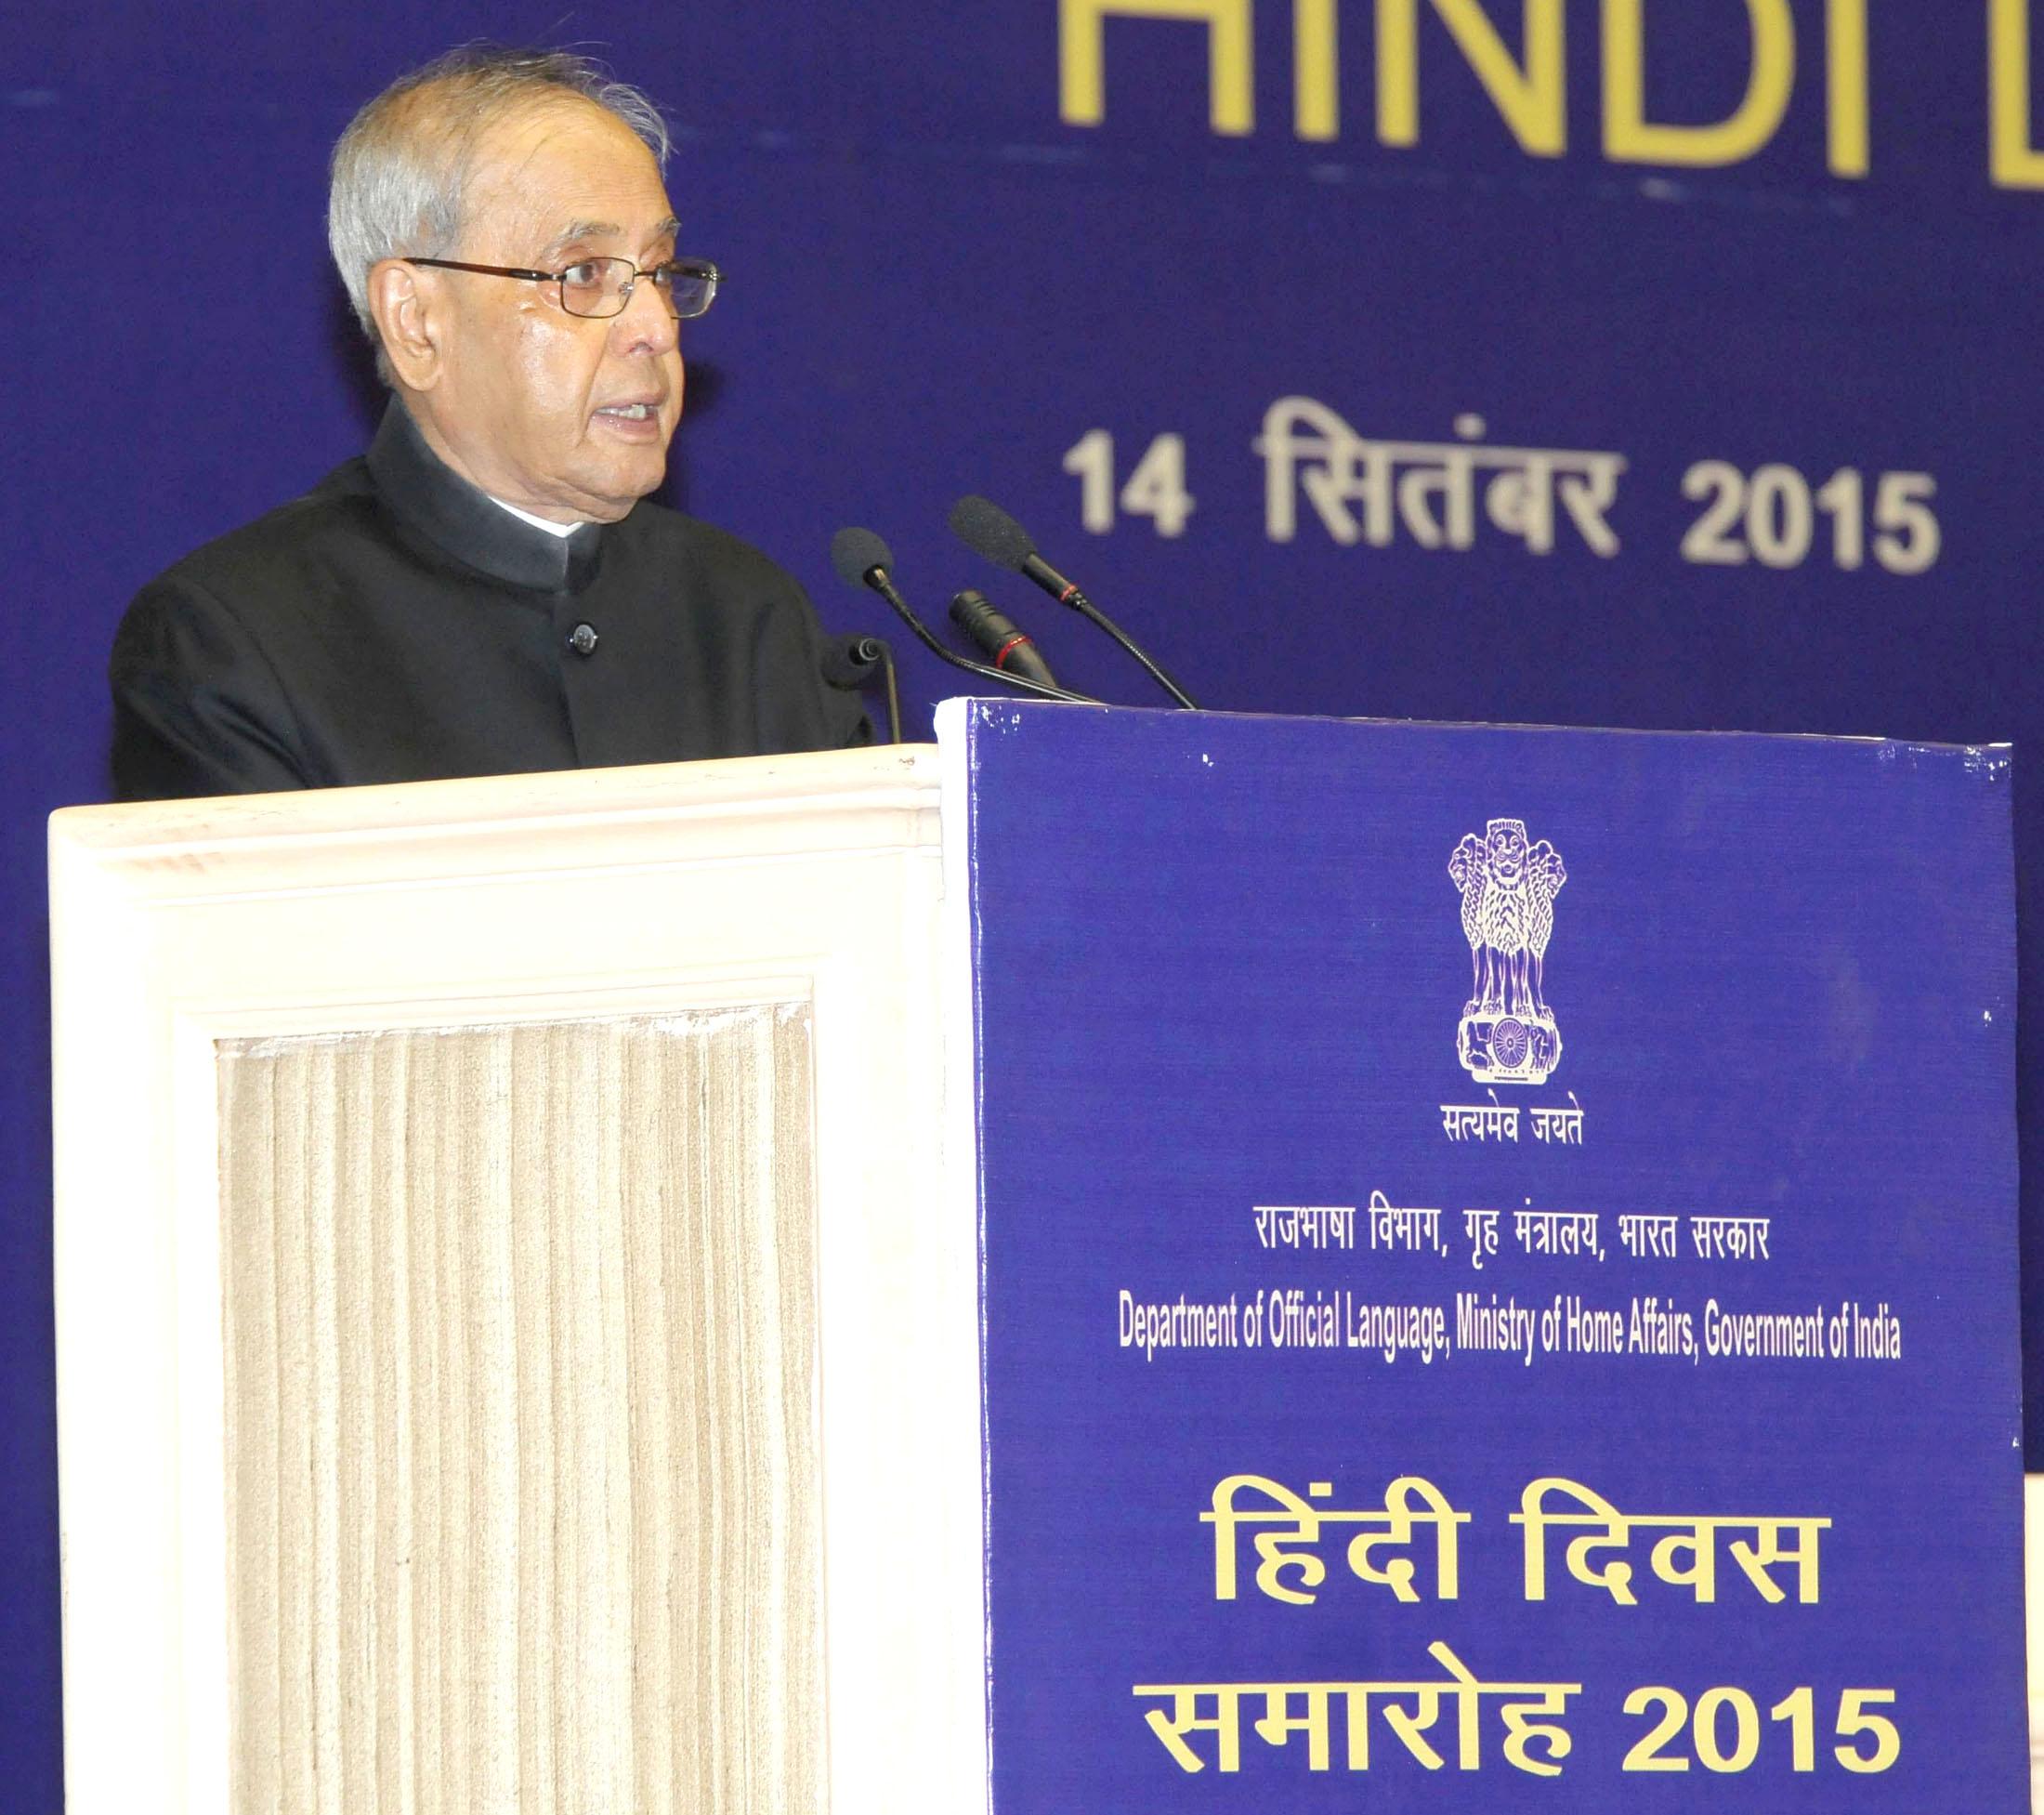 The President, Shri Pranab Mukherjee addressing at the Hindi Divas Samaroh, in New Delhi on September 14, 2015.